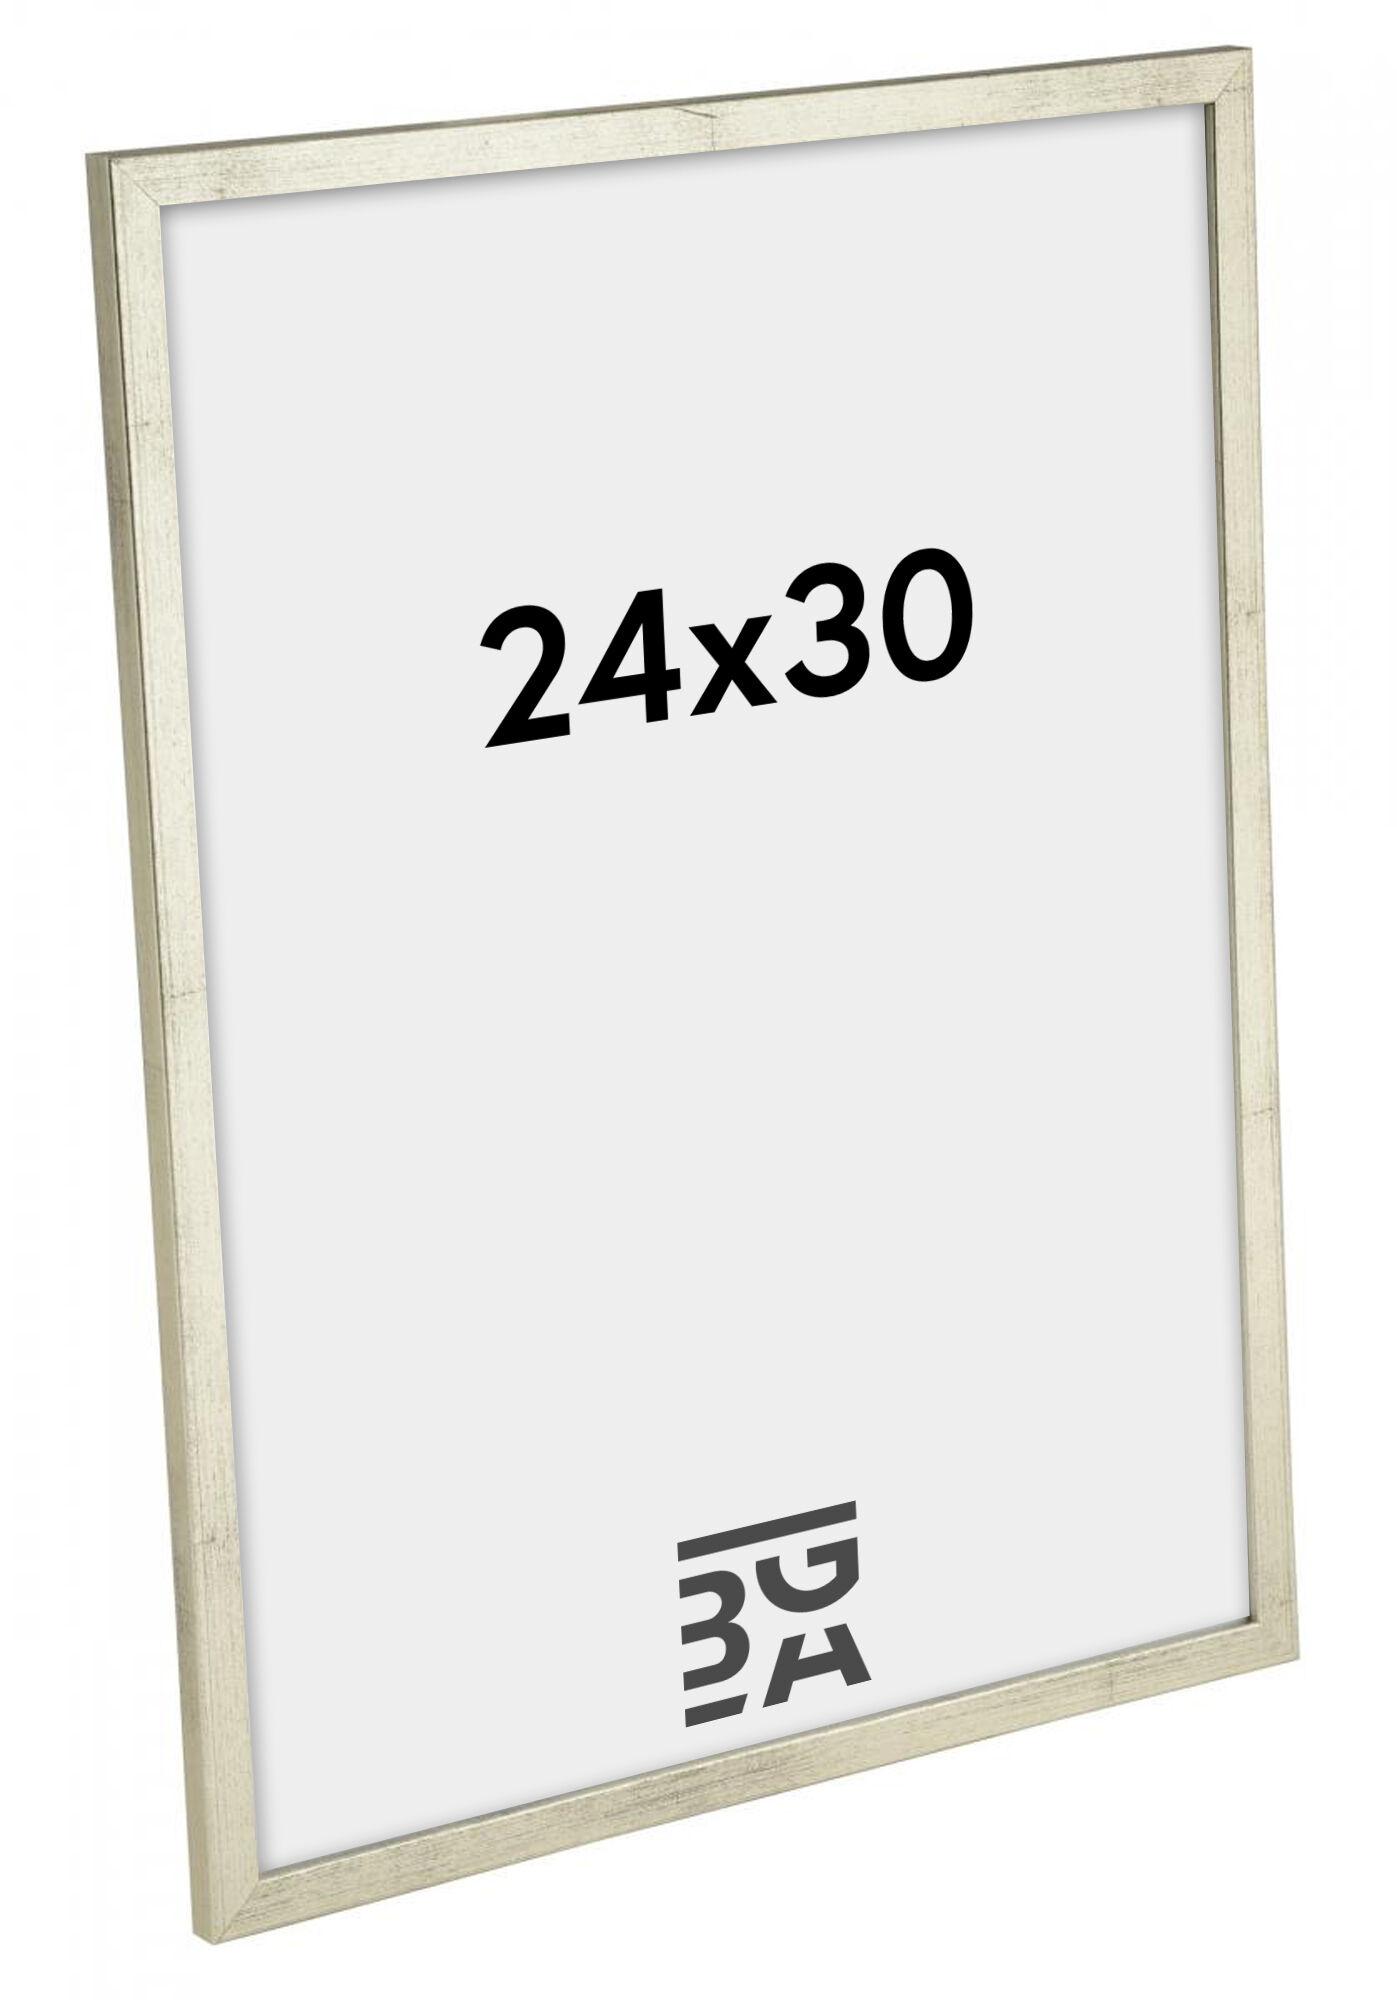 Estancia Galant Hopeanvärinen 24x30 cm